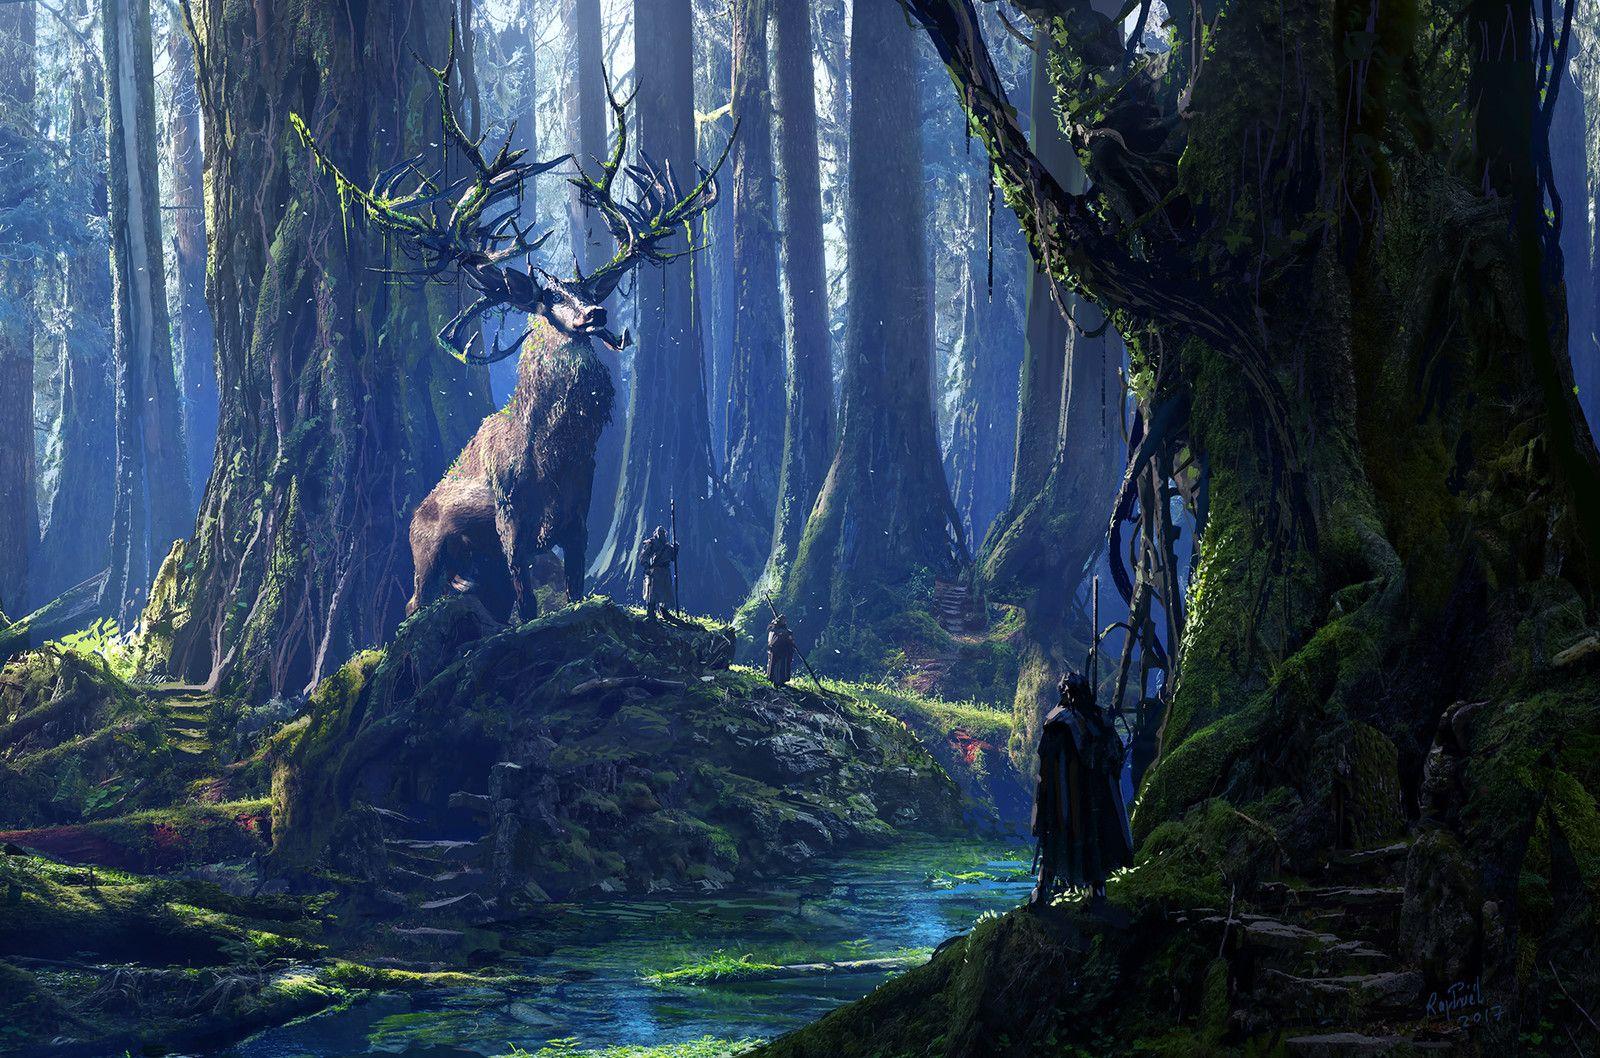 Cernunnos and his Druids, Raphael Lacoste on ArtStation at https://www.artstation.com/artwork/RZgGv